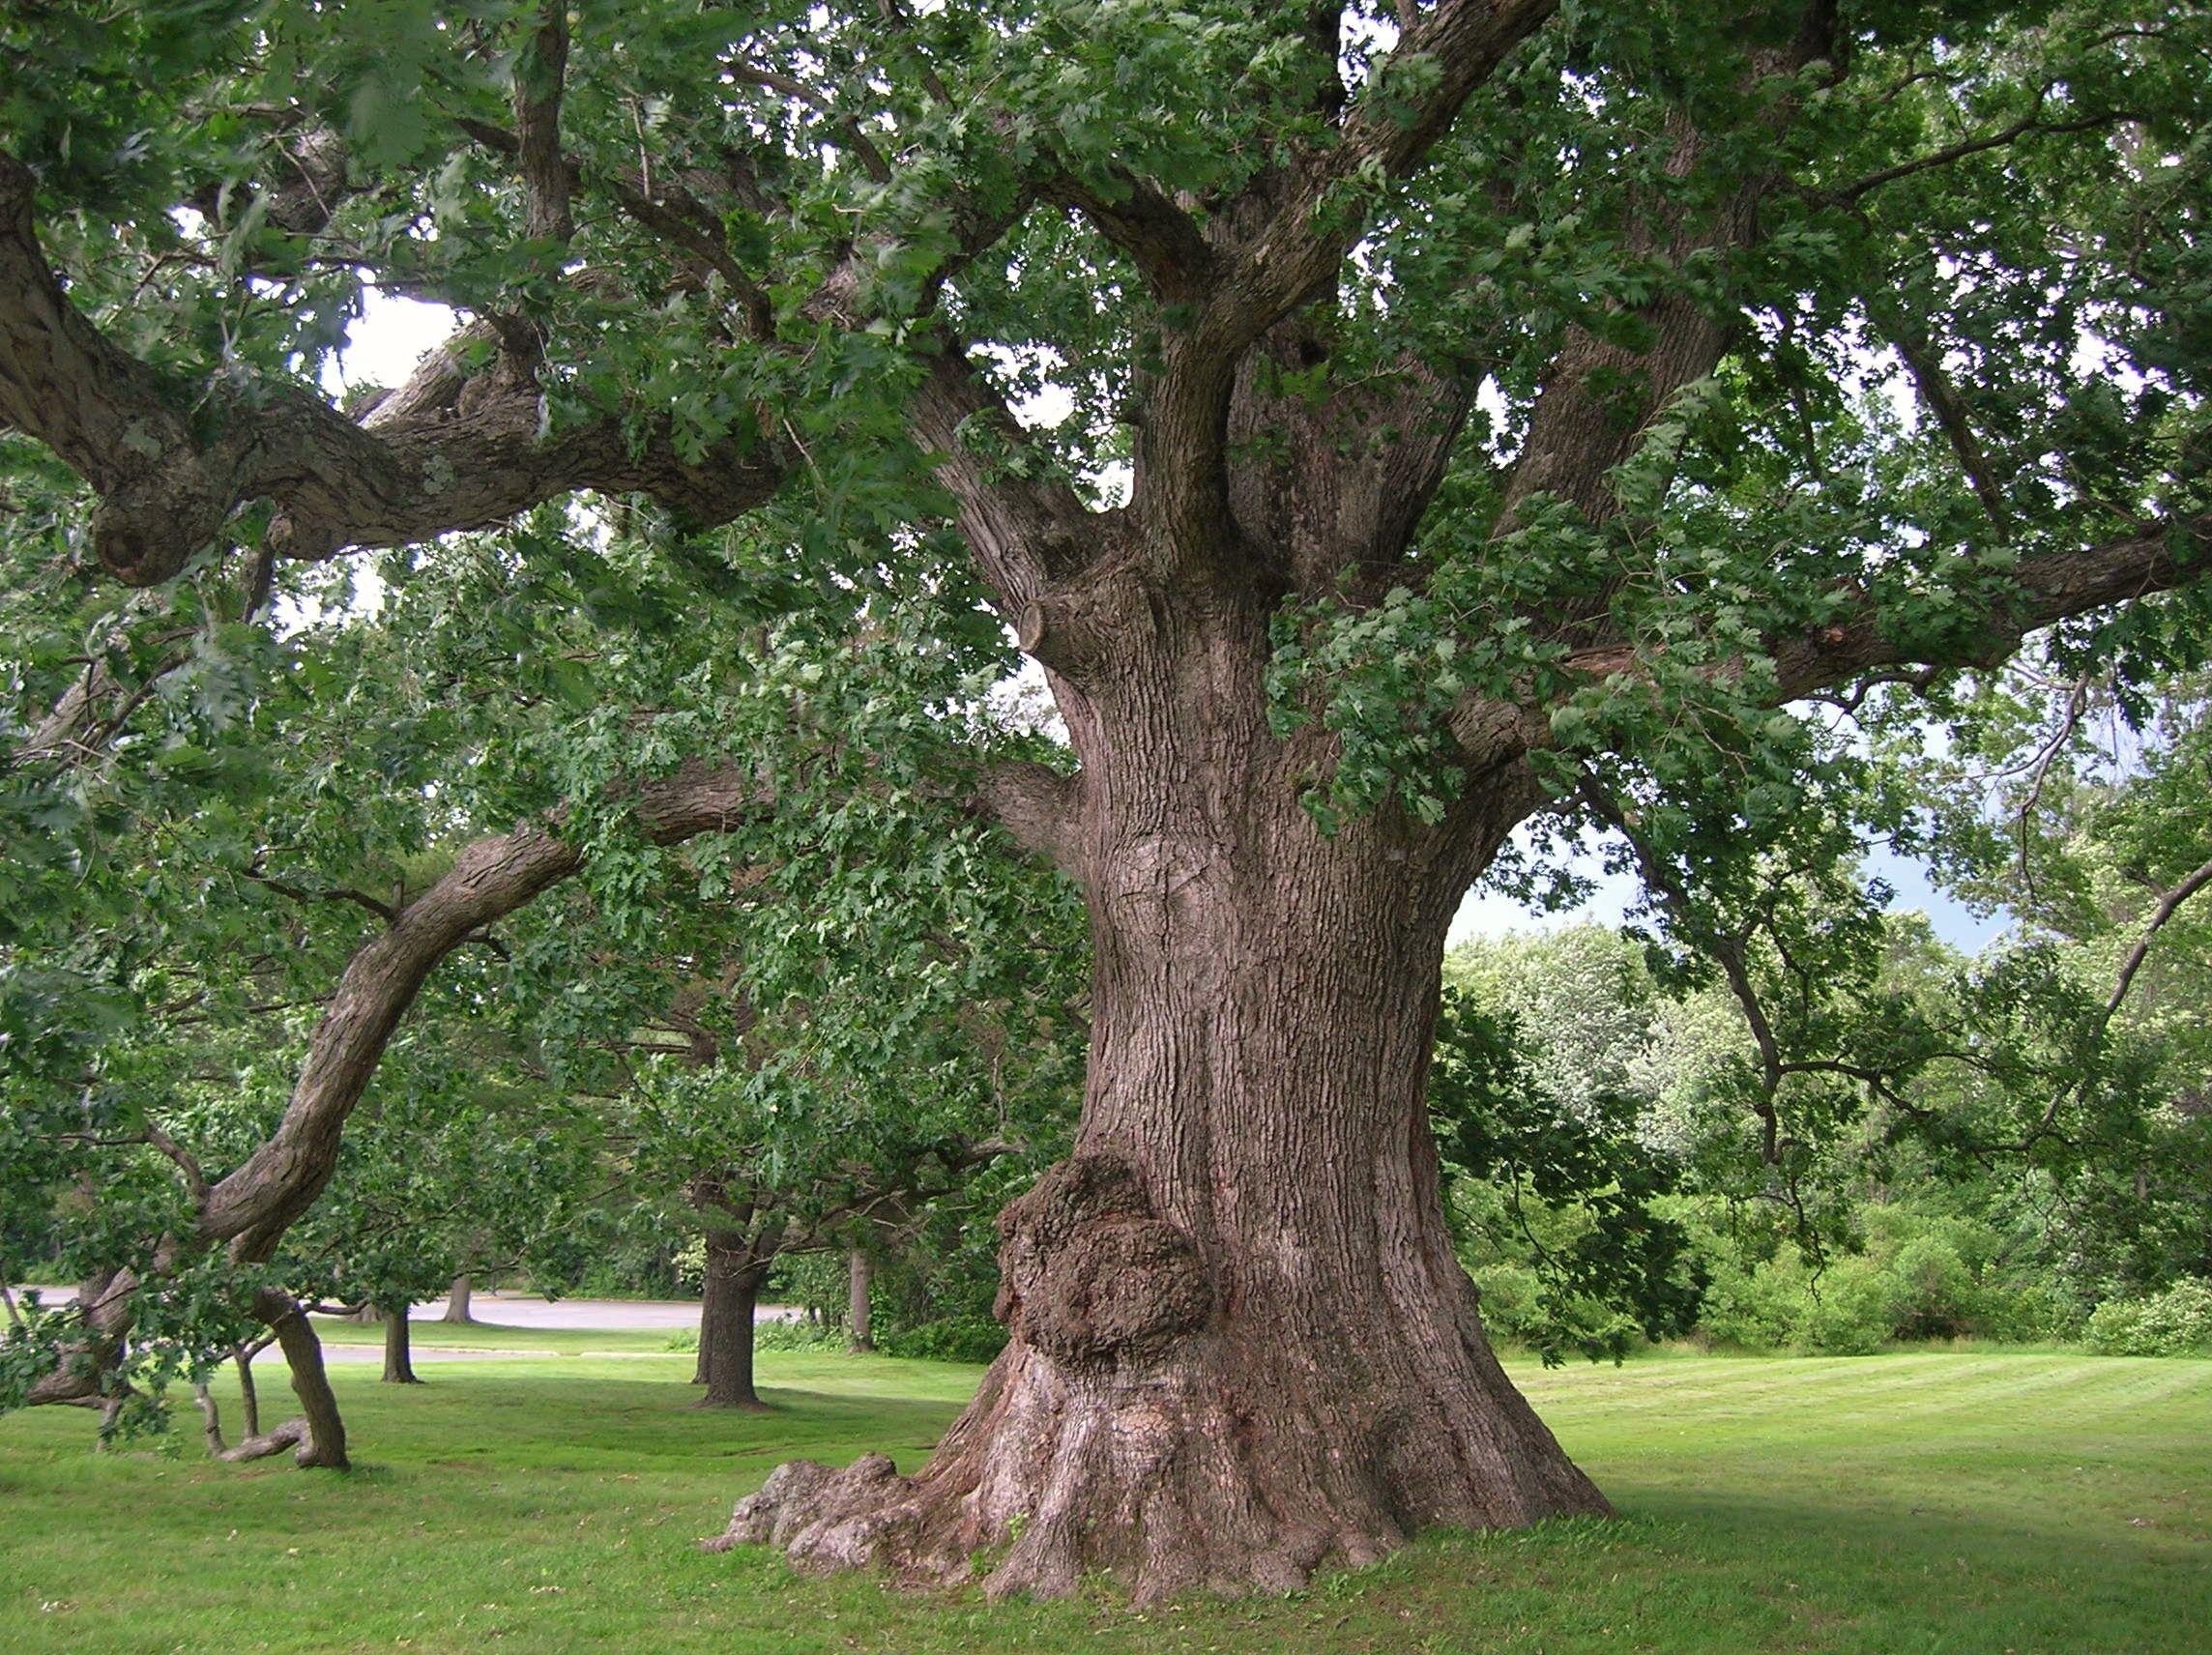 Tree borers amp bark beetles arborx tree health care - White Oak Tree